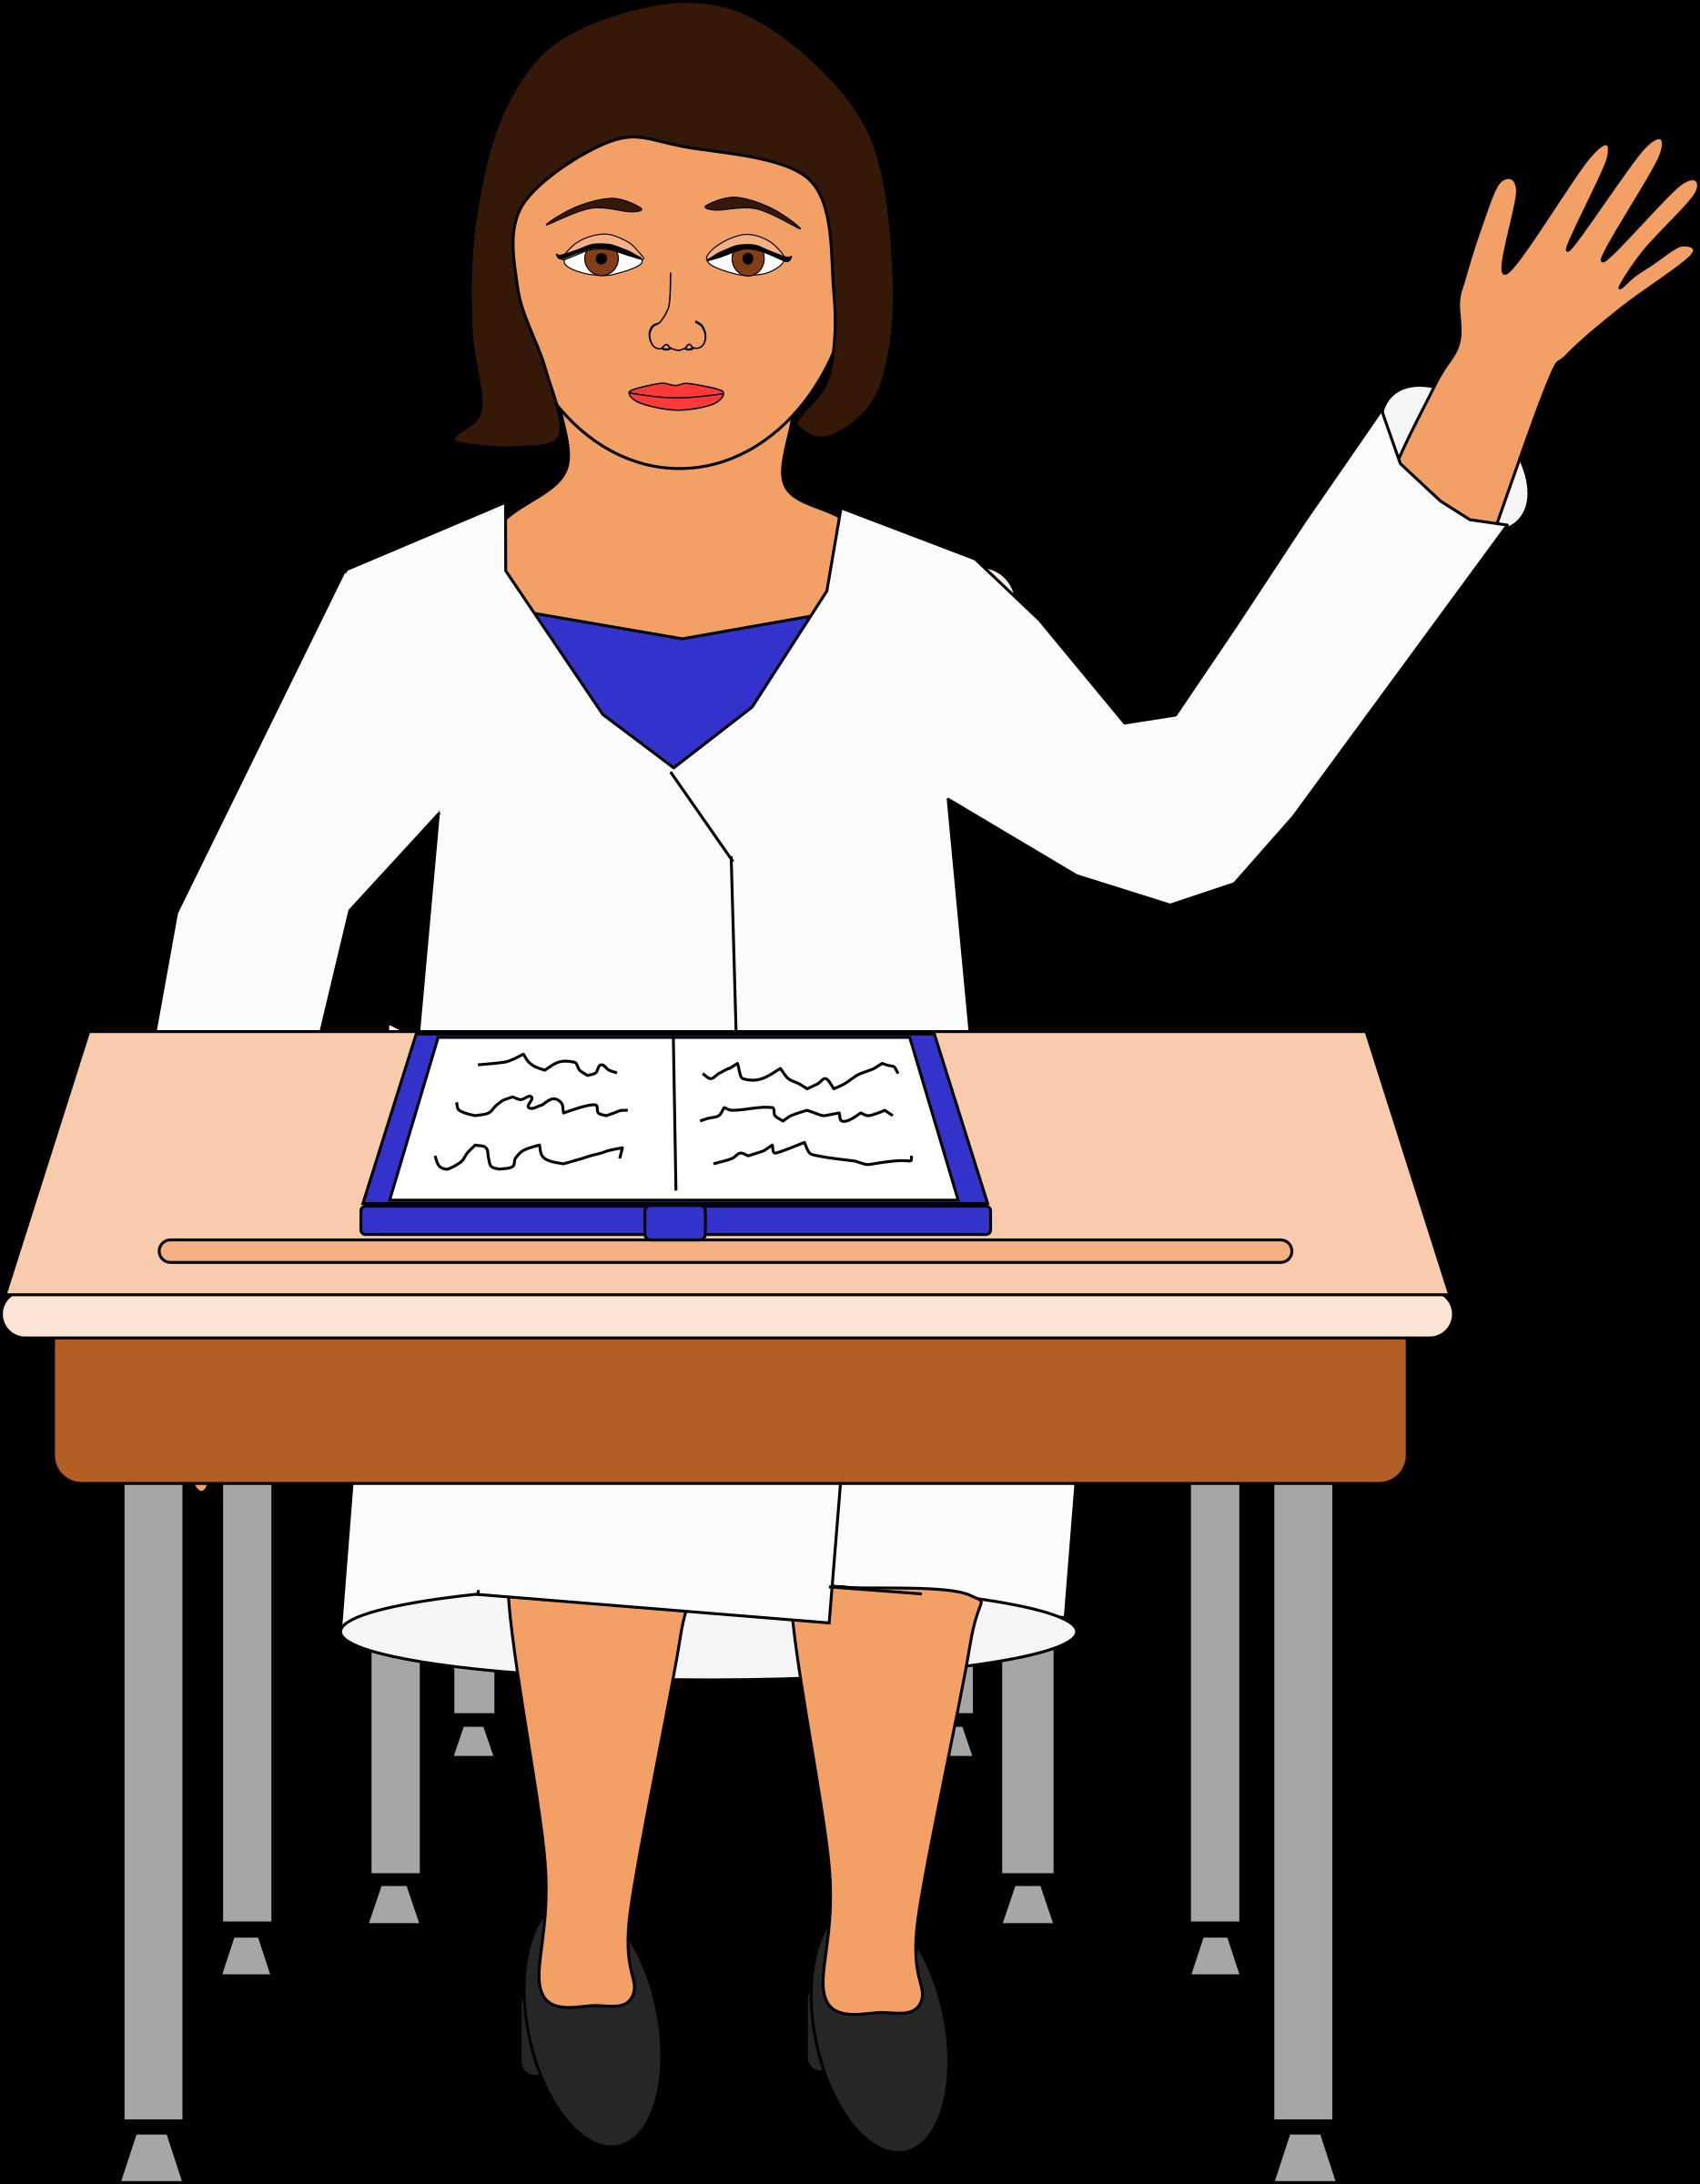 Desk clipart person. Girl raising her hand